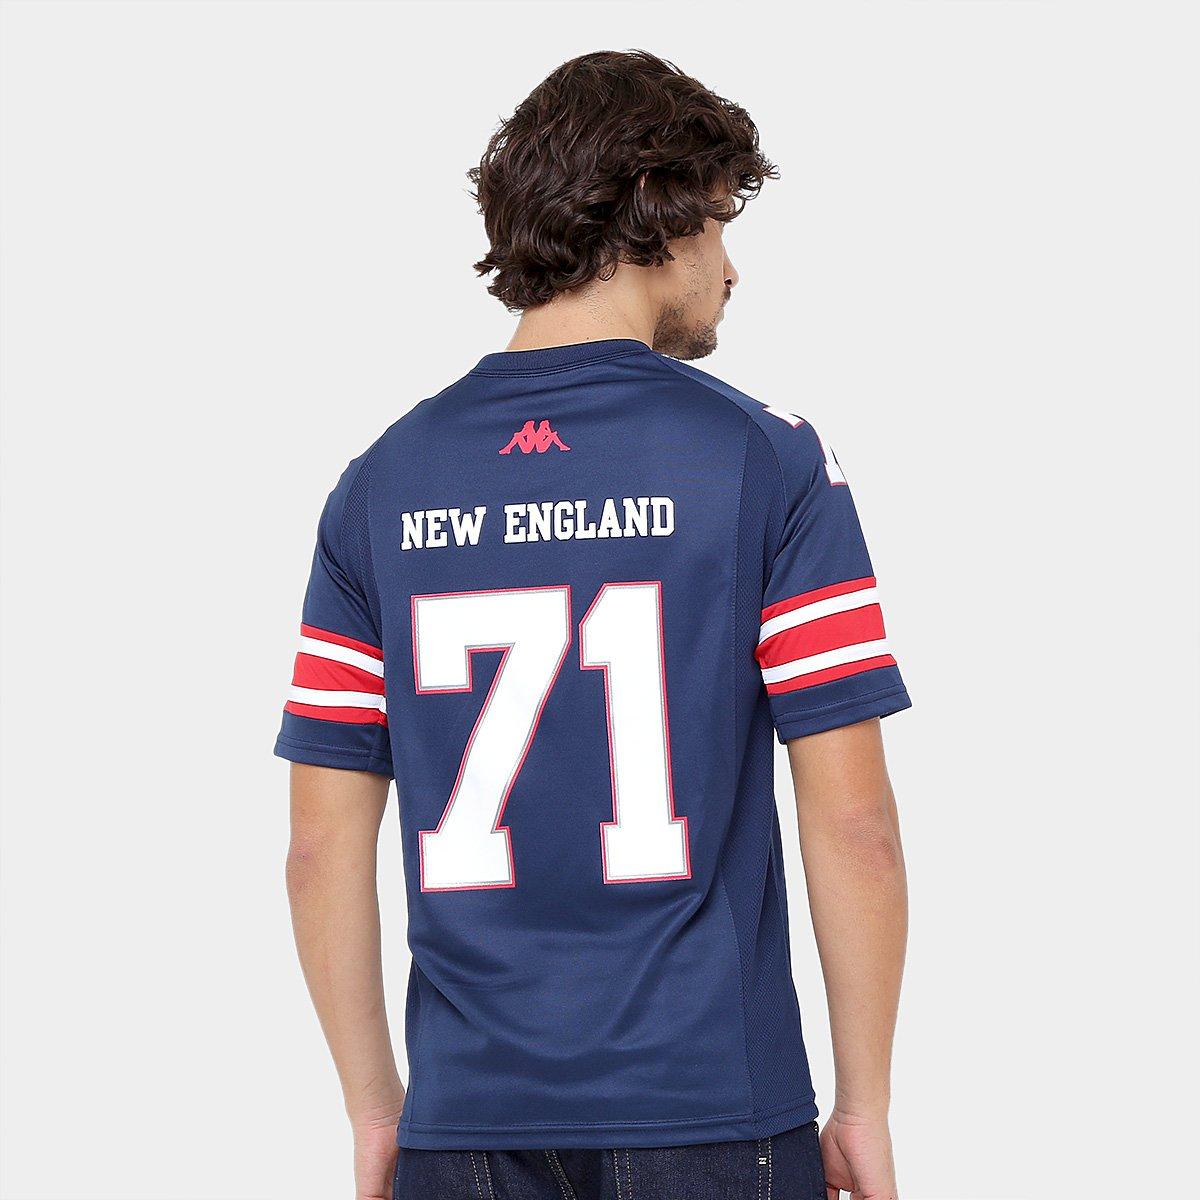 Camiseta New England Kappa Futebol Americano Masculina - Compre ... efaa30a2888e0